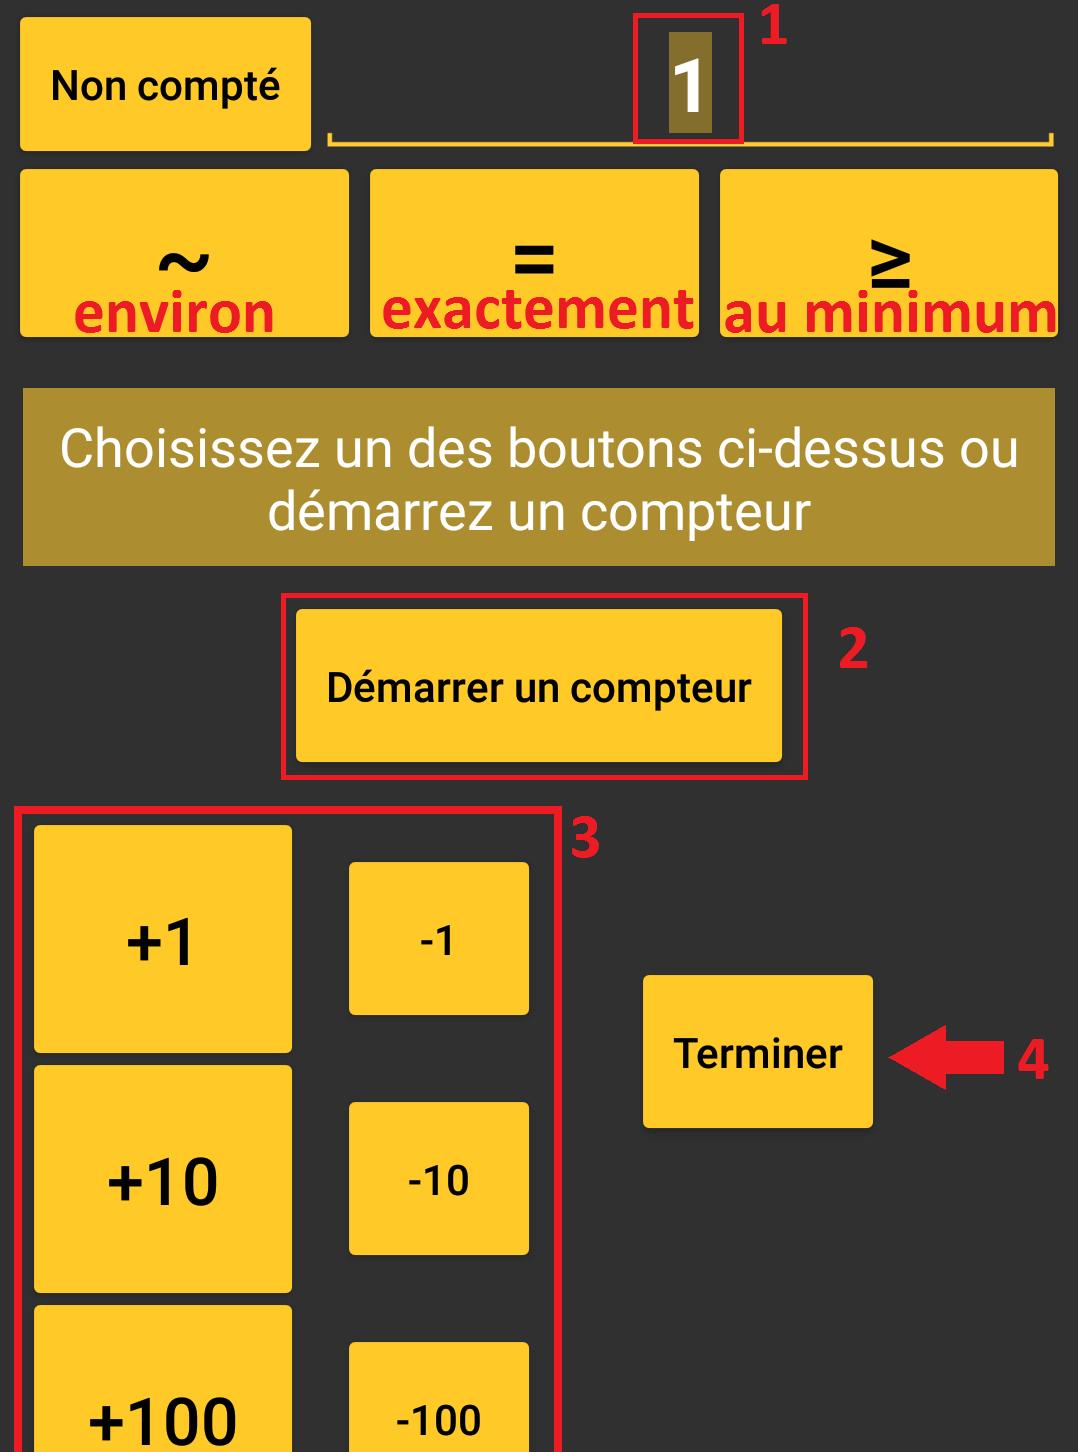 https://cdnfiles2.biolovision.net/www.faune-france.org/userfiles/ListeNaturaList/5-effectif-compteur.png